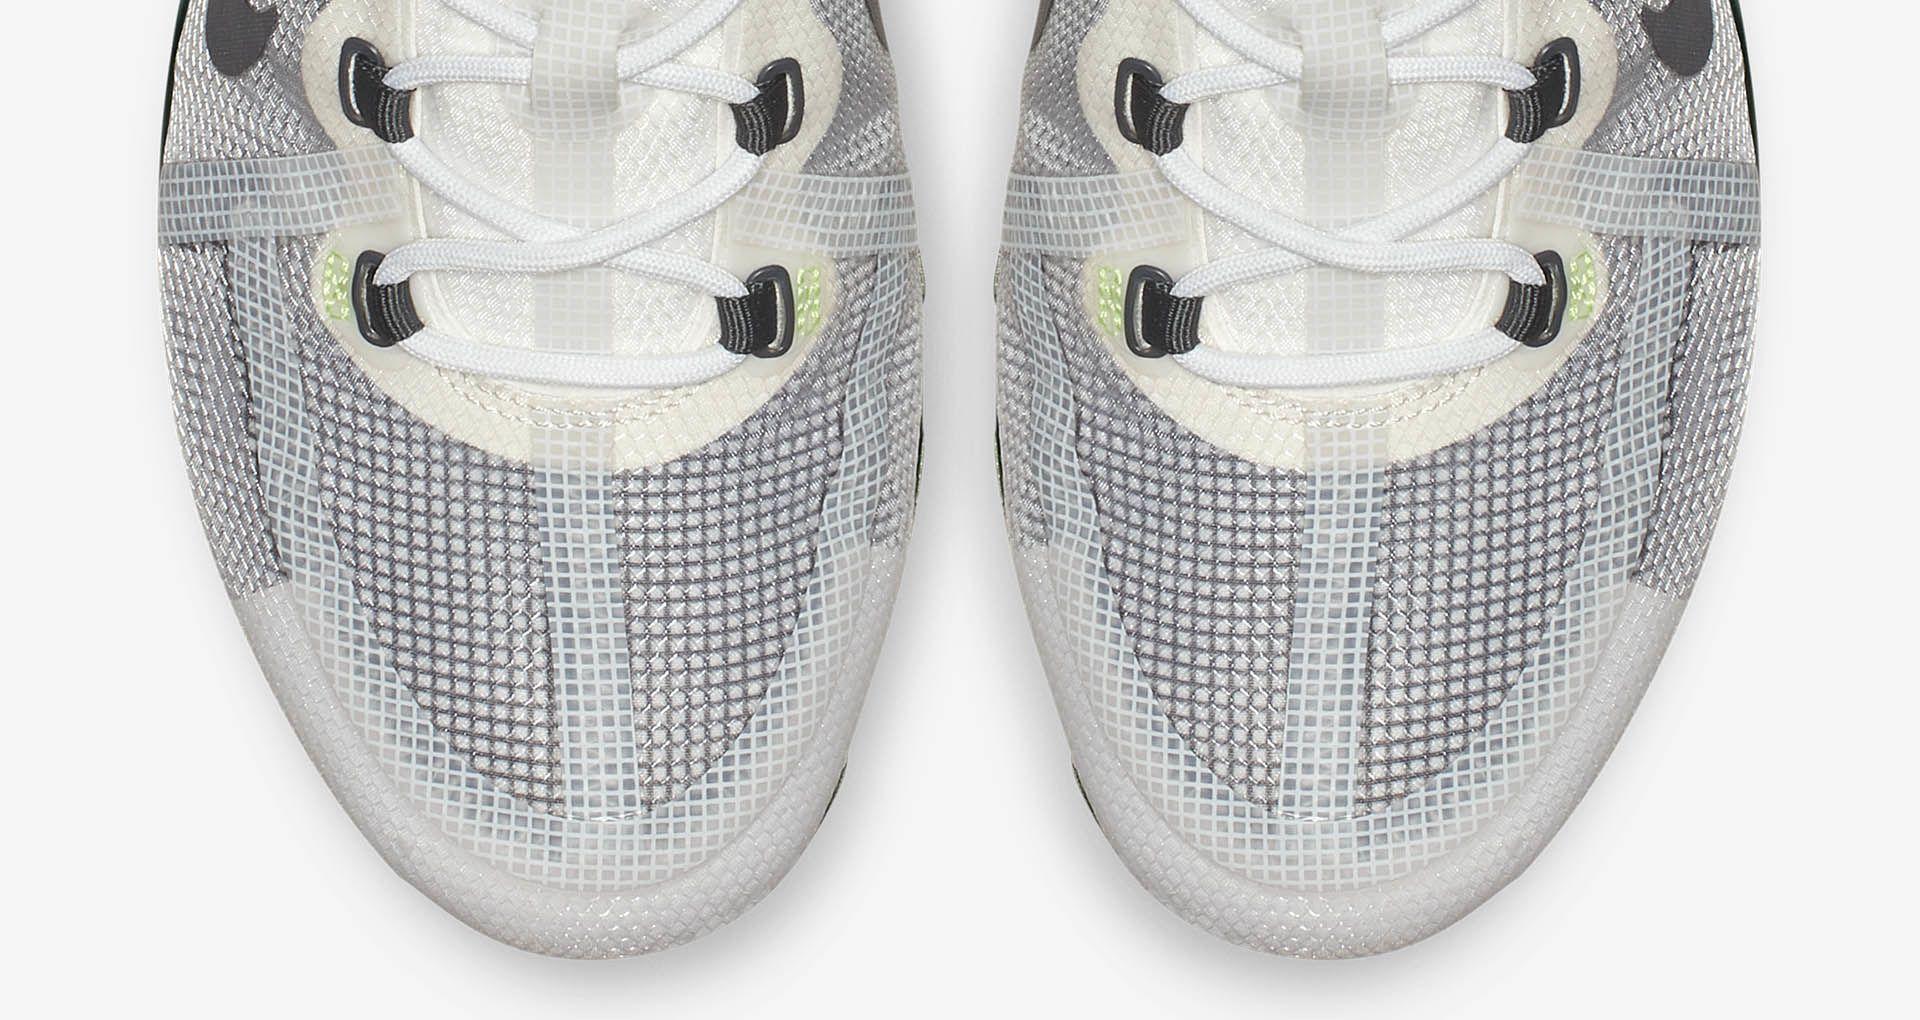 online store genuine shoes new lifestyle Nike Air Vapormax 2019 'Premium White & Platinum Tint ...